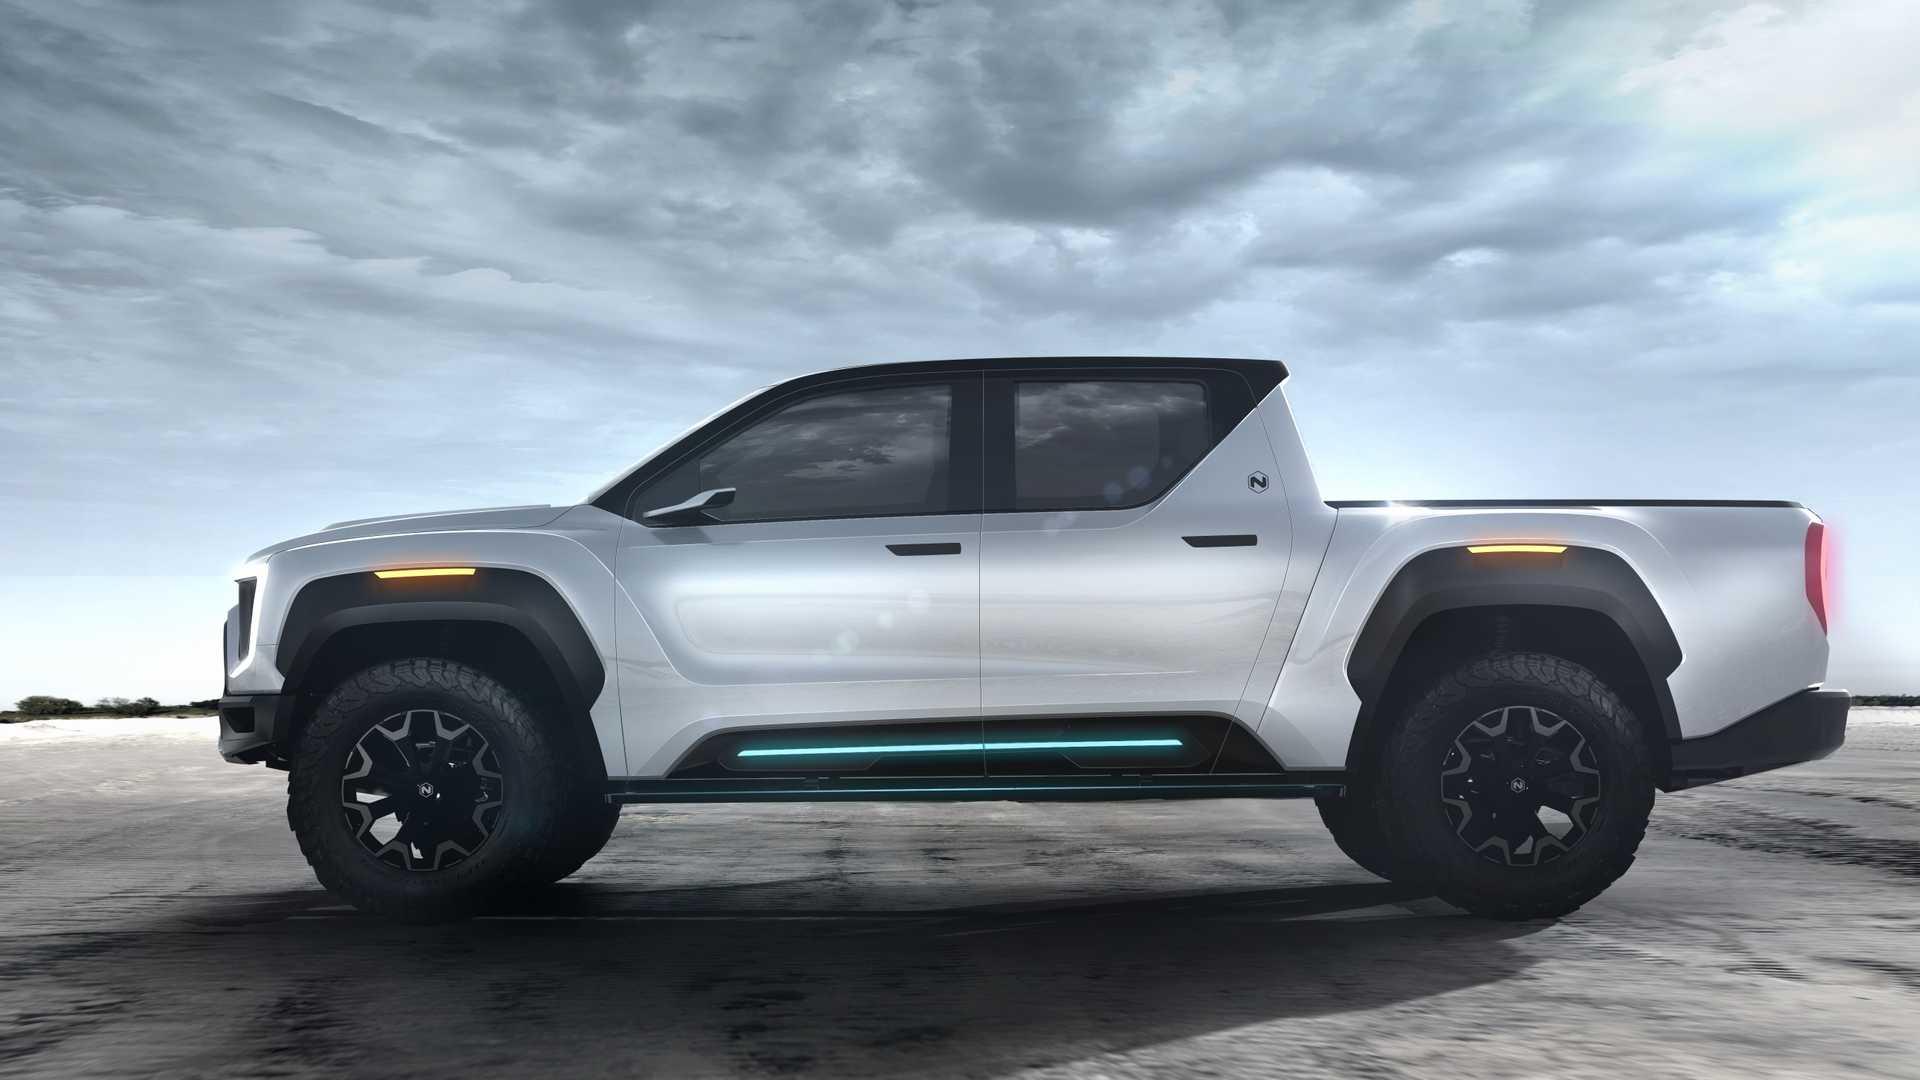 Nikola apresenta pick-up elétrica que promete mais de 900 km de autonomia